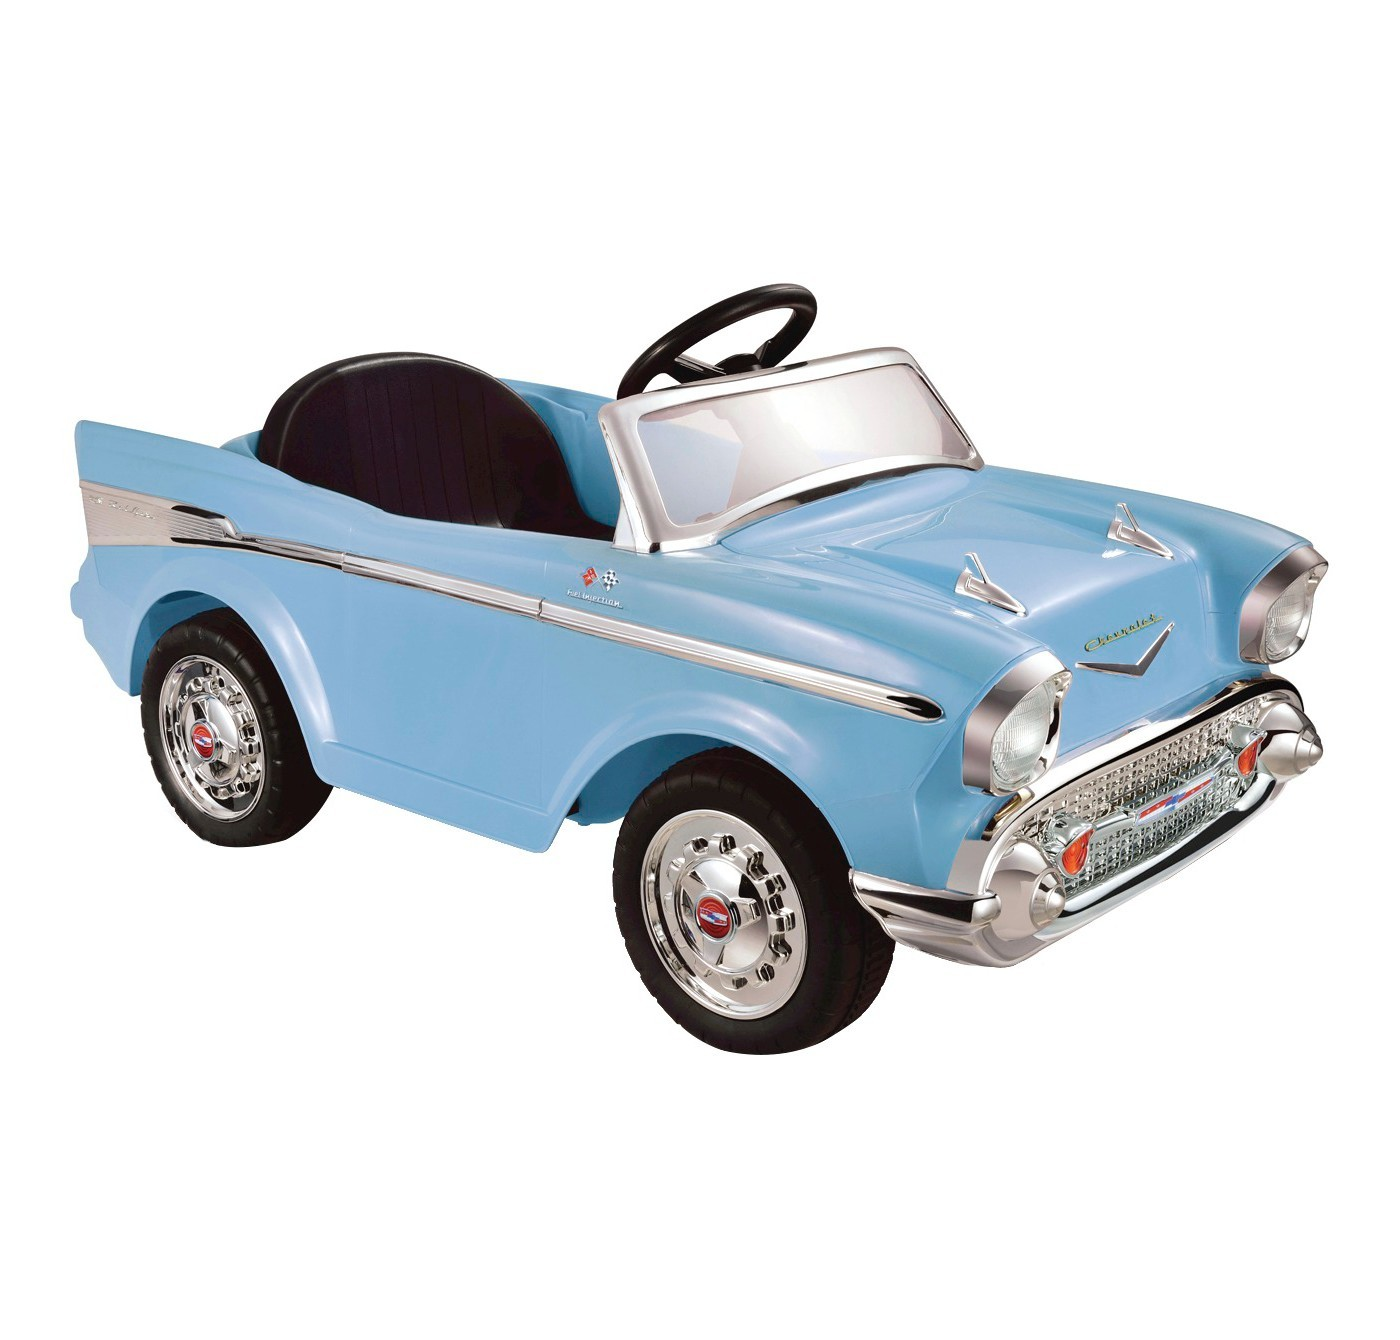 vintage car toy